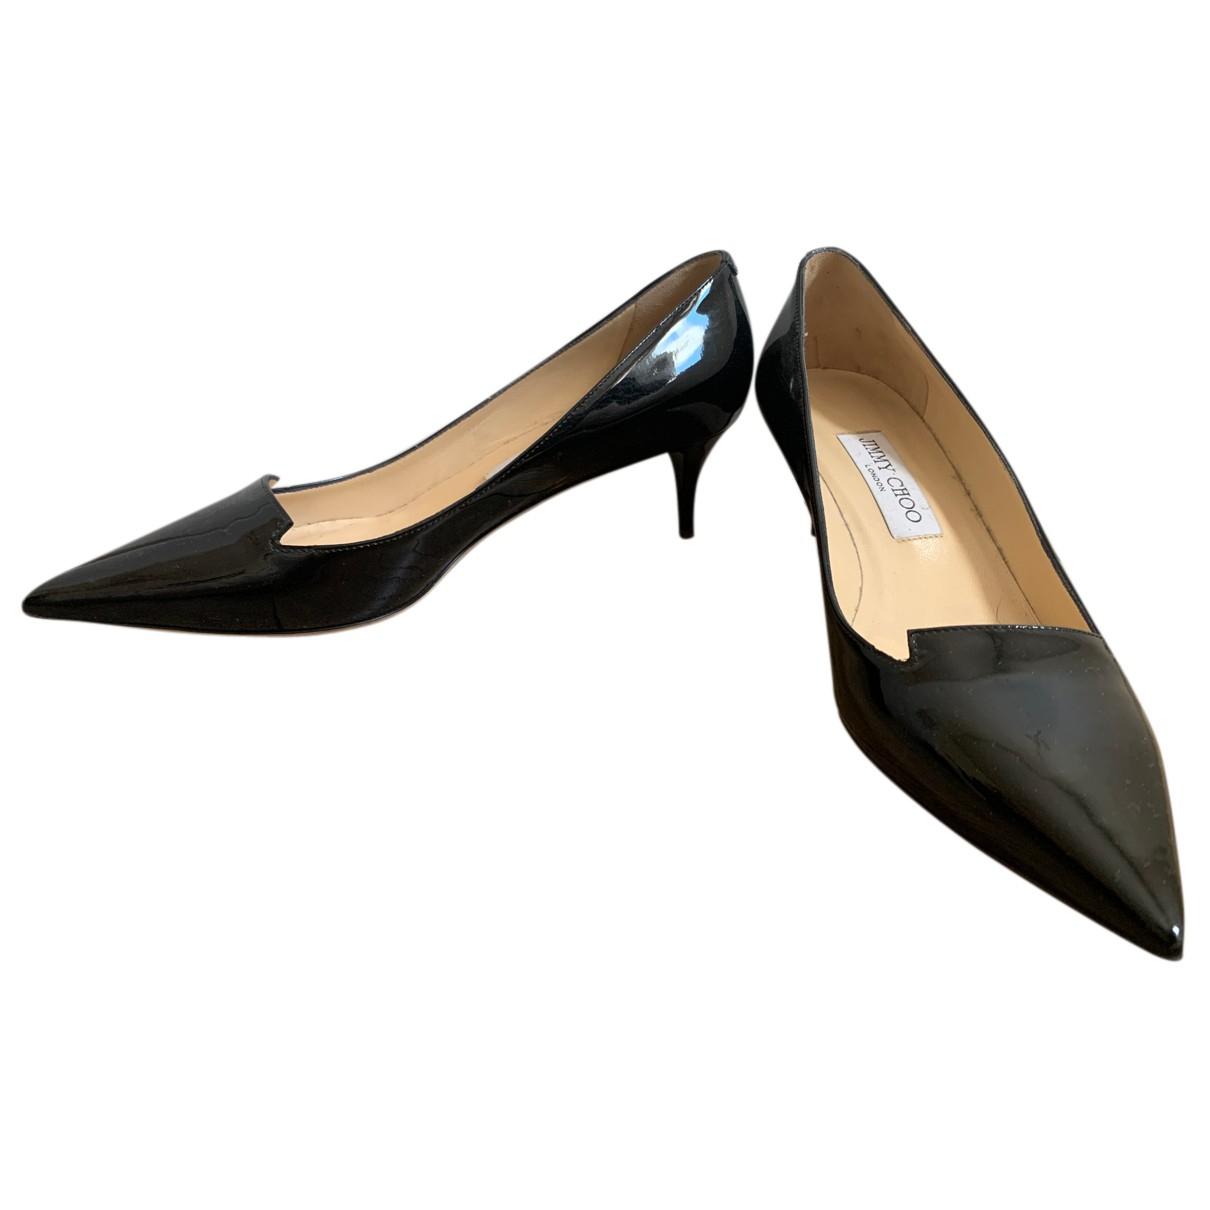 Jimmy Choo N Black Patent leather Heels for Women 38.5 EU